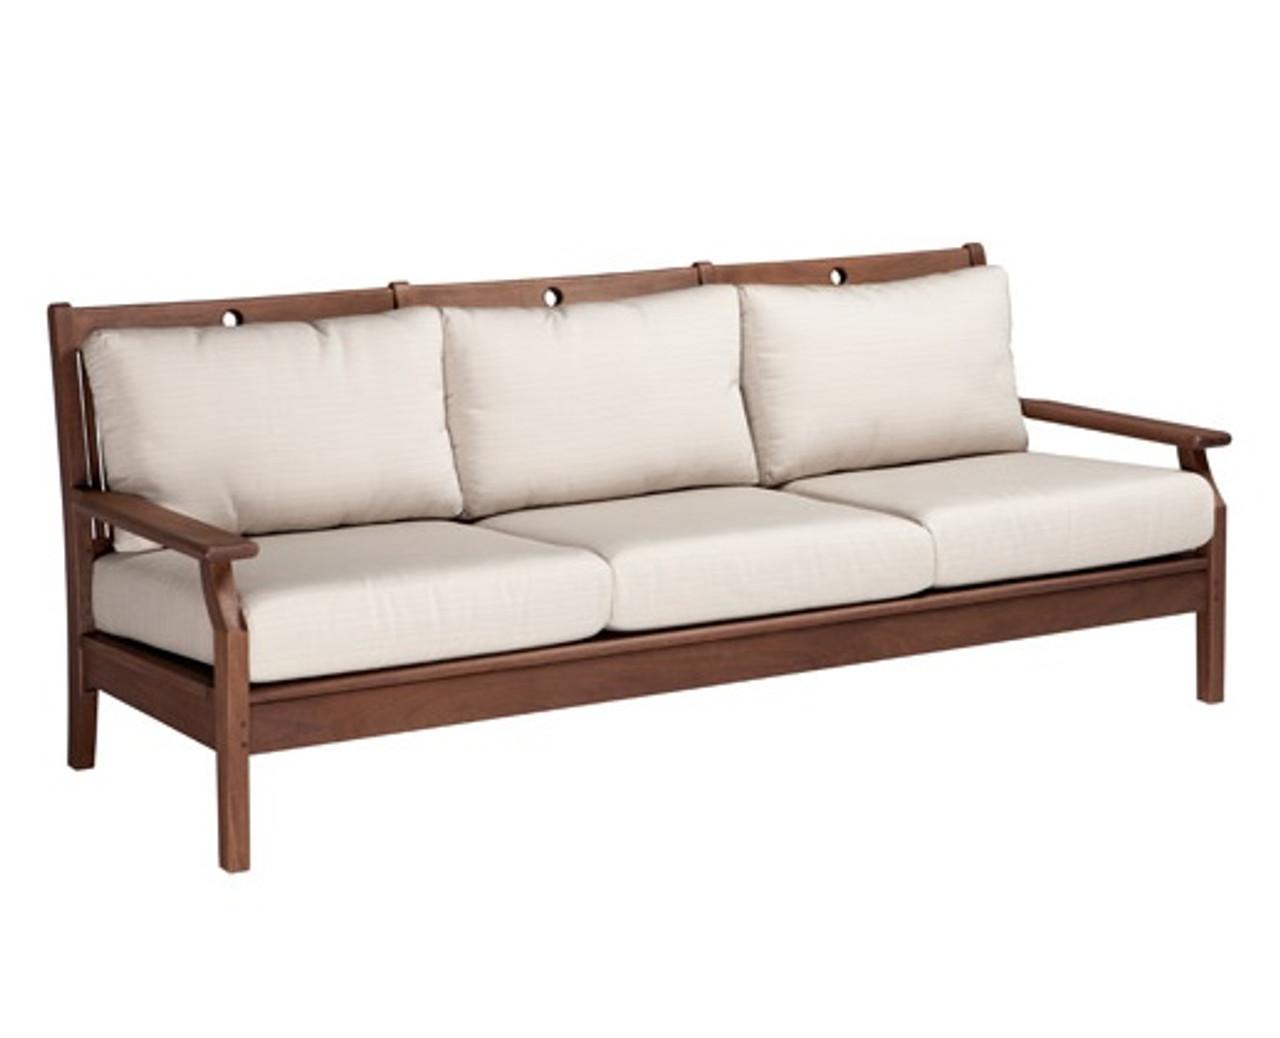 Jensen Leisure Opal Collection Sofa